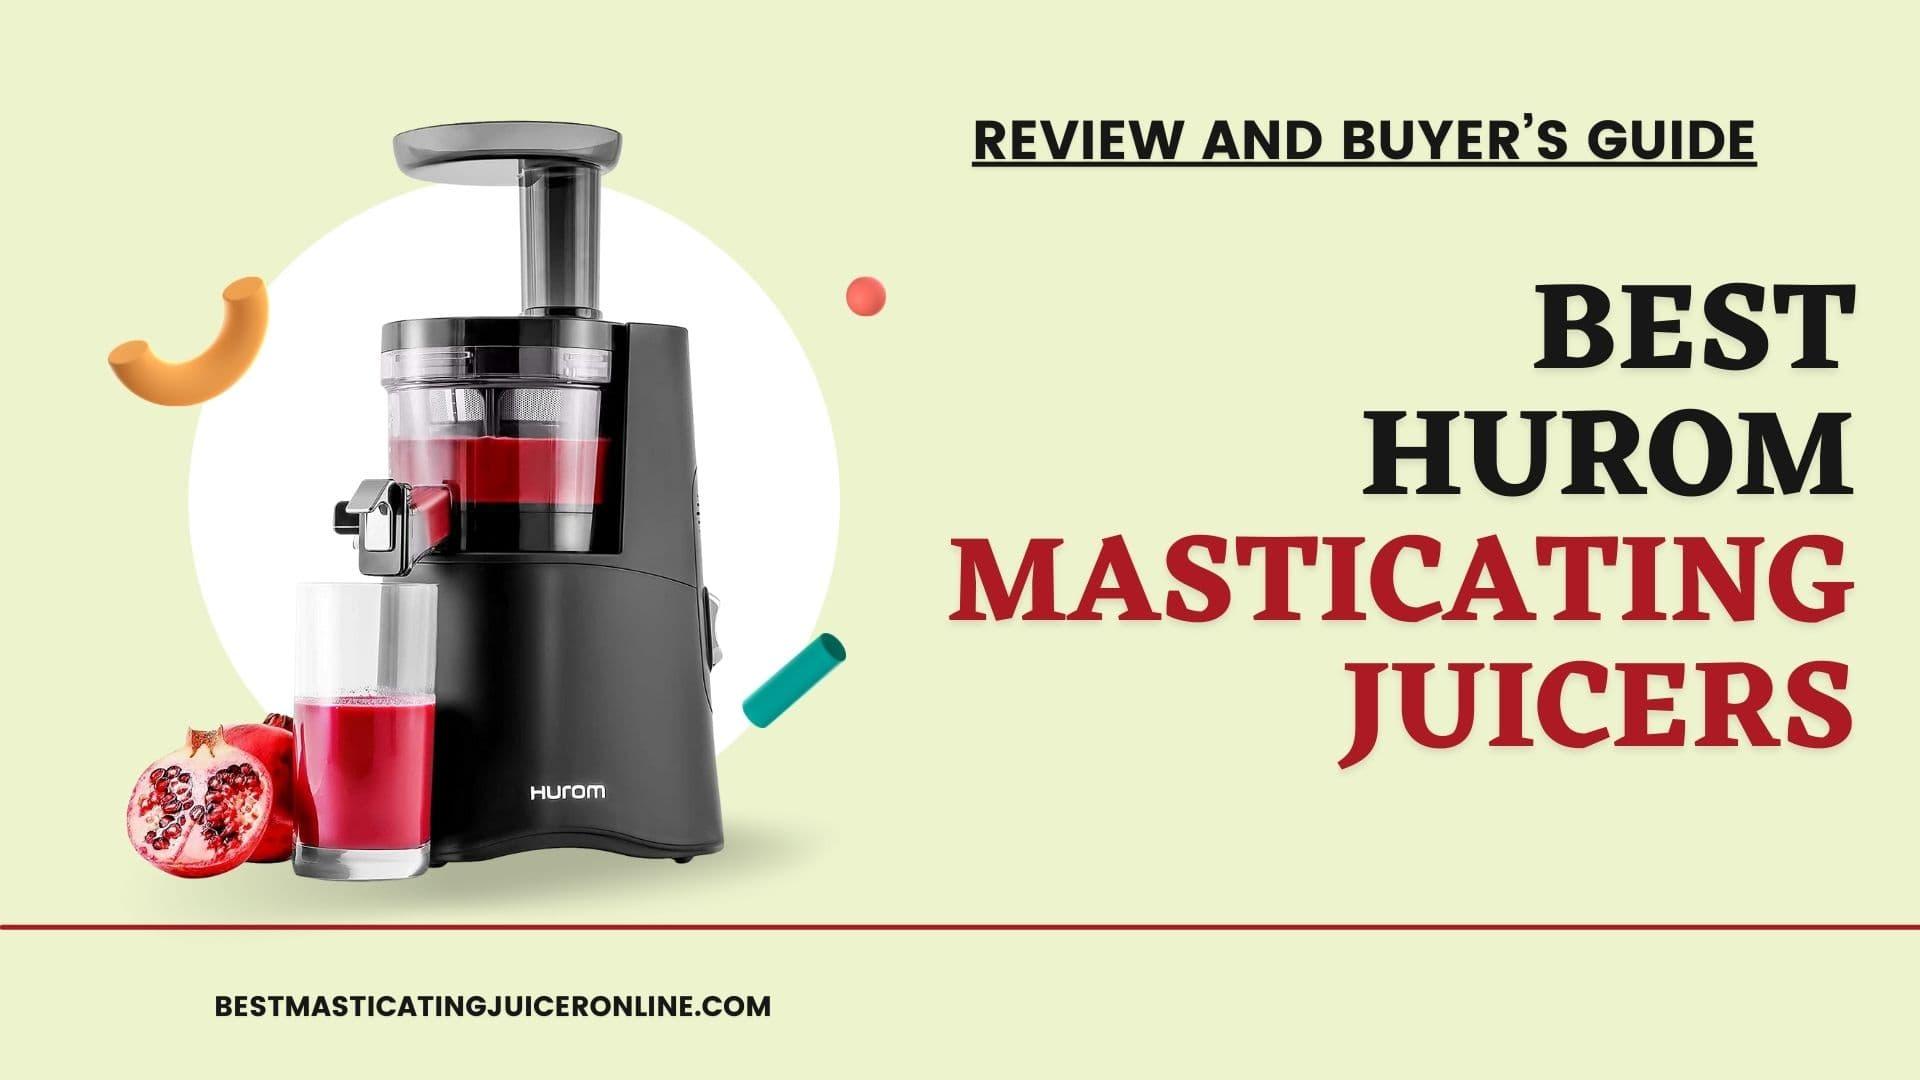 Best Hurom Masticating Juicers